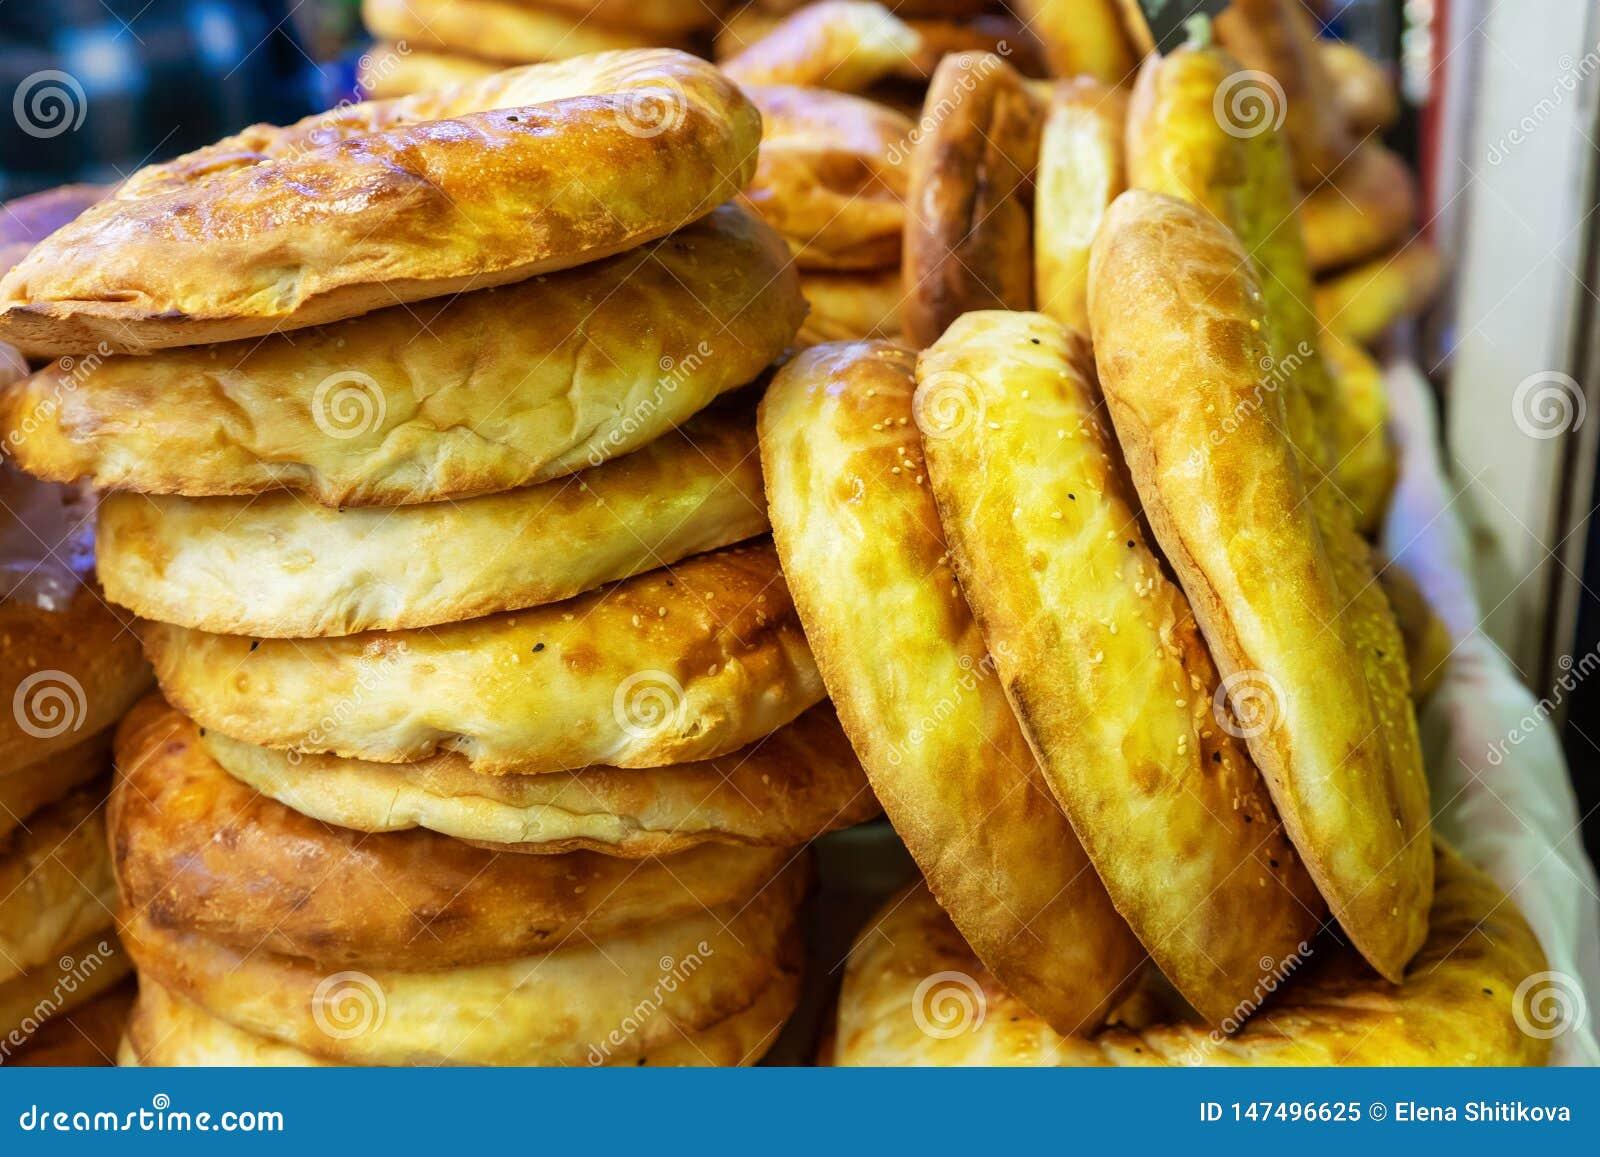 Lavash armeno Pane bianco rotondo